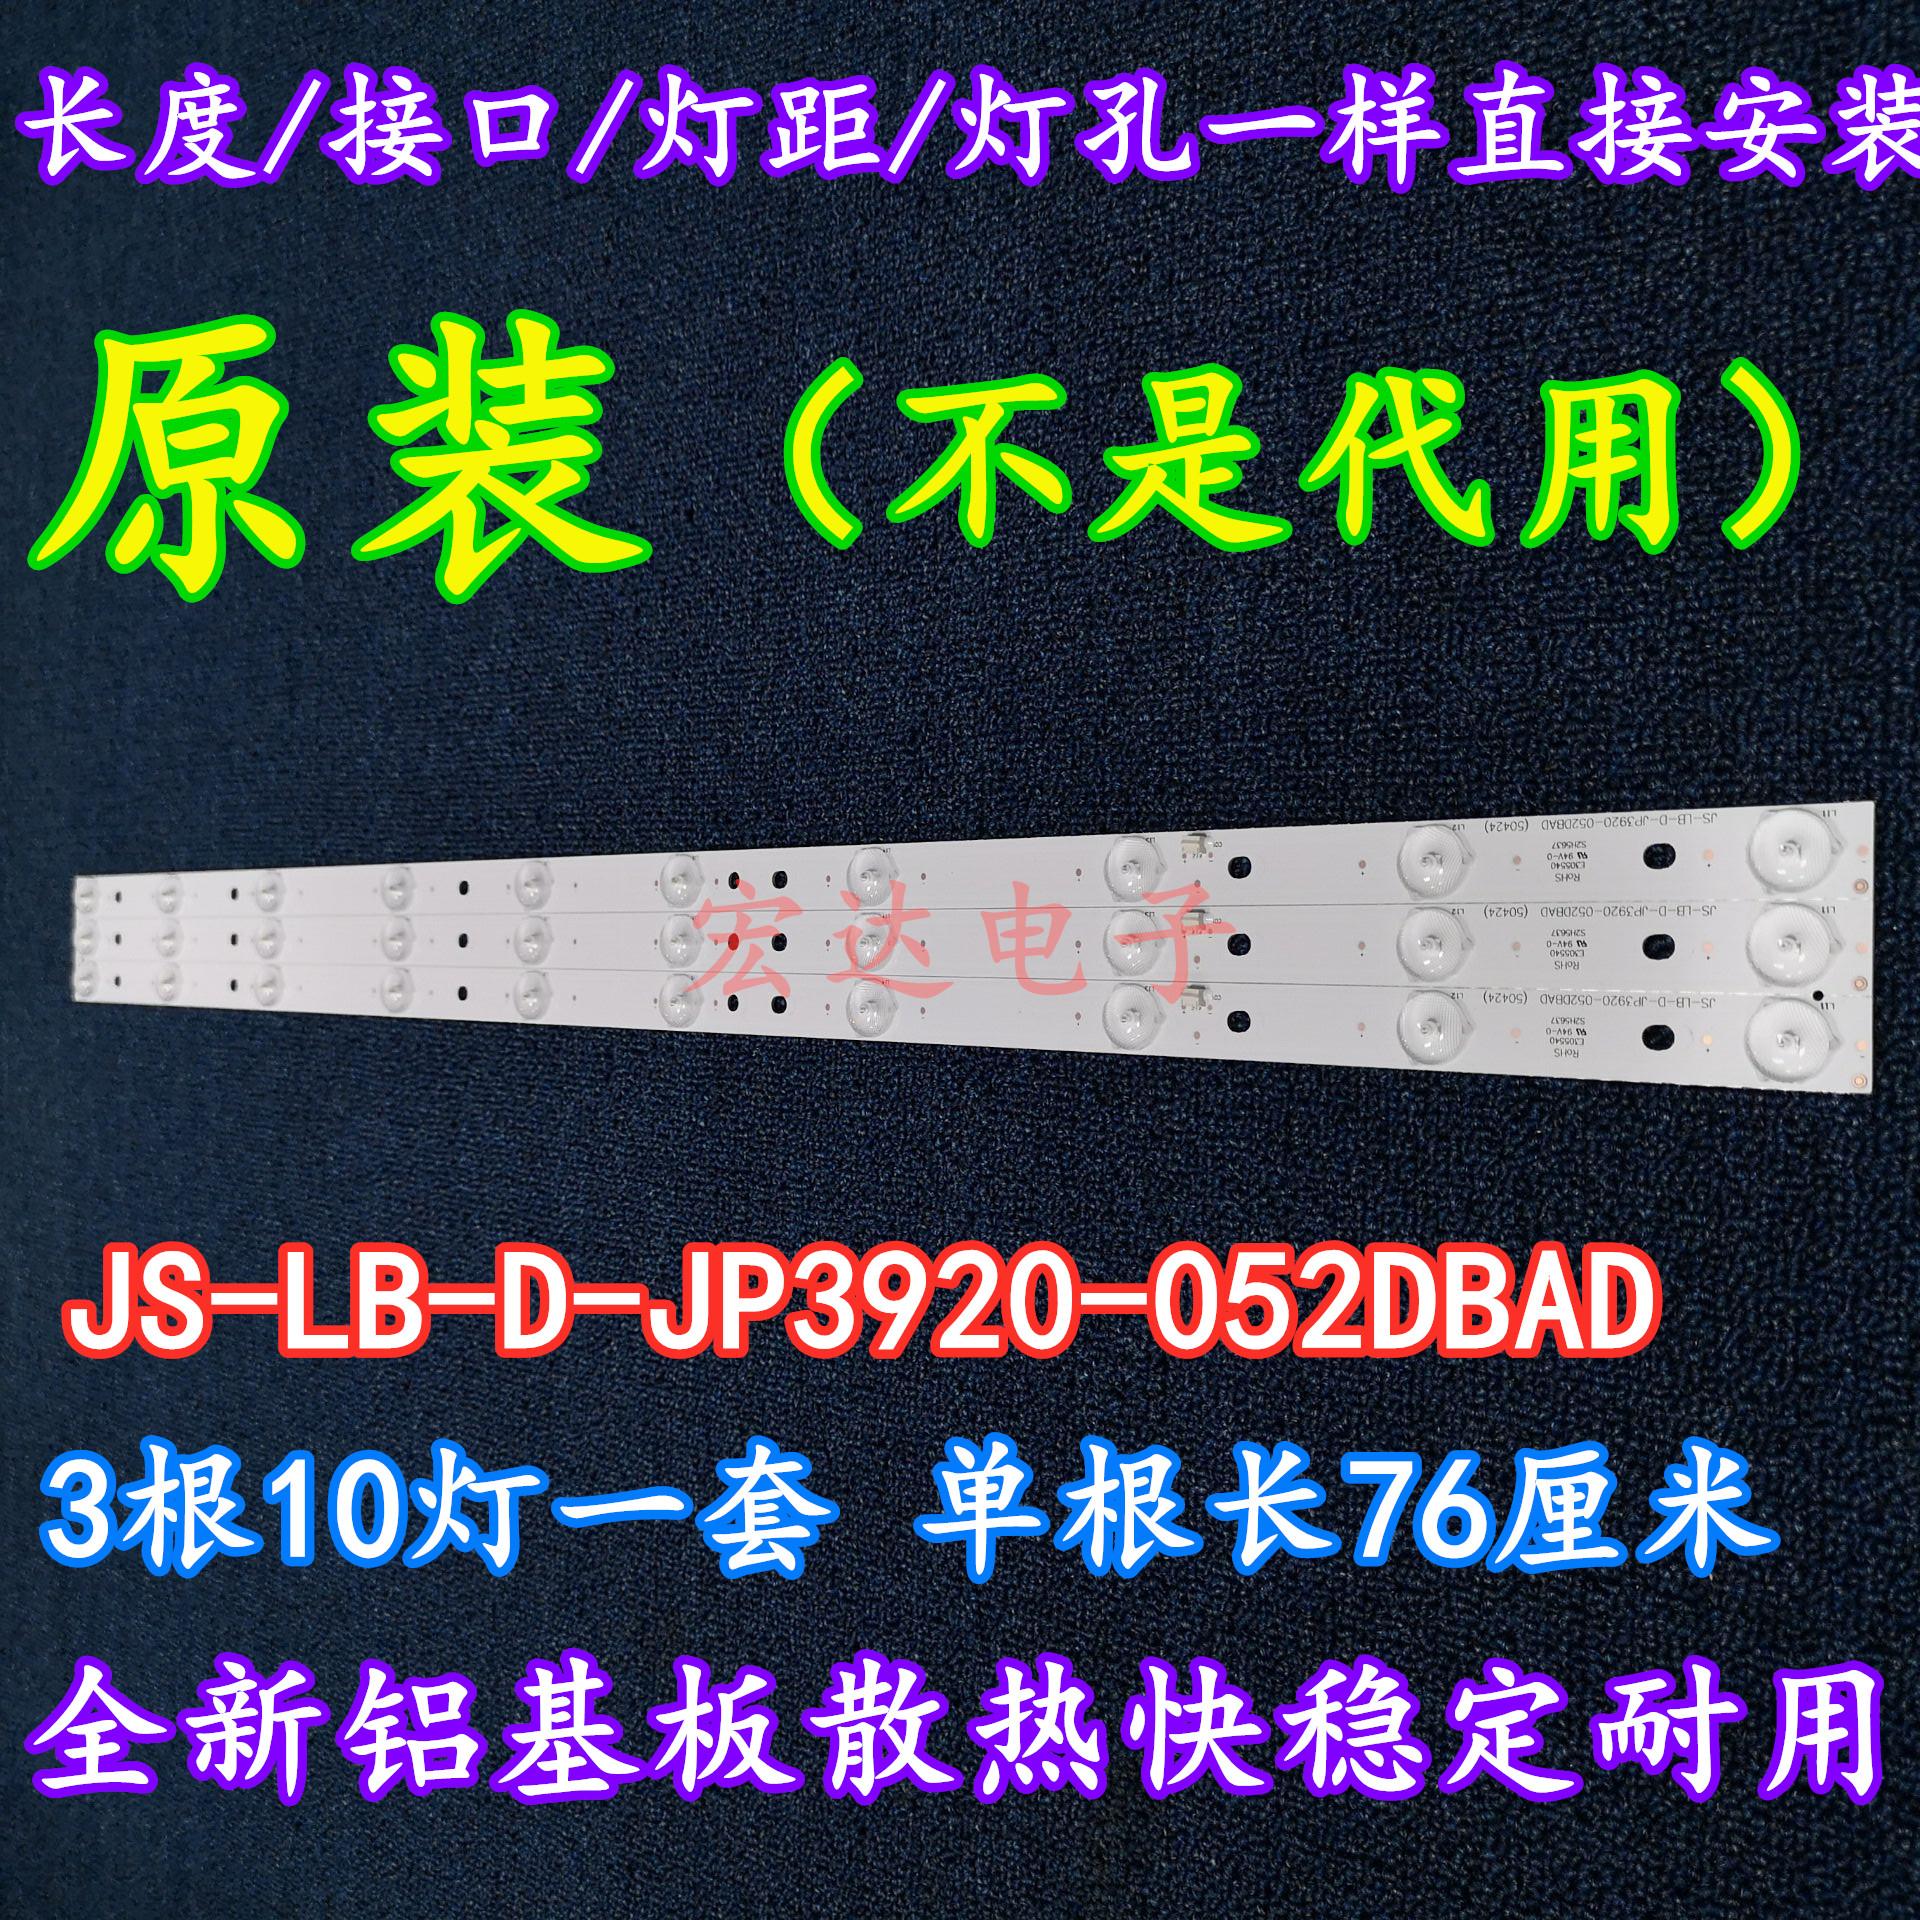 乐华LED39C310A灯条D39-2000 JS-LB-D-JP3920-052DBAD 10灯76CM